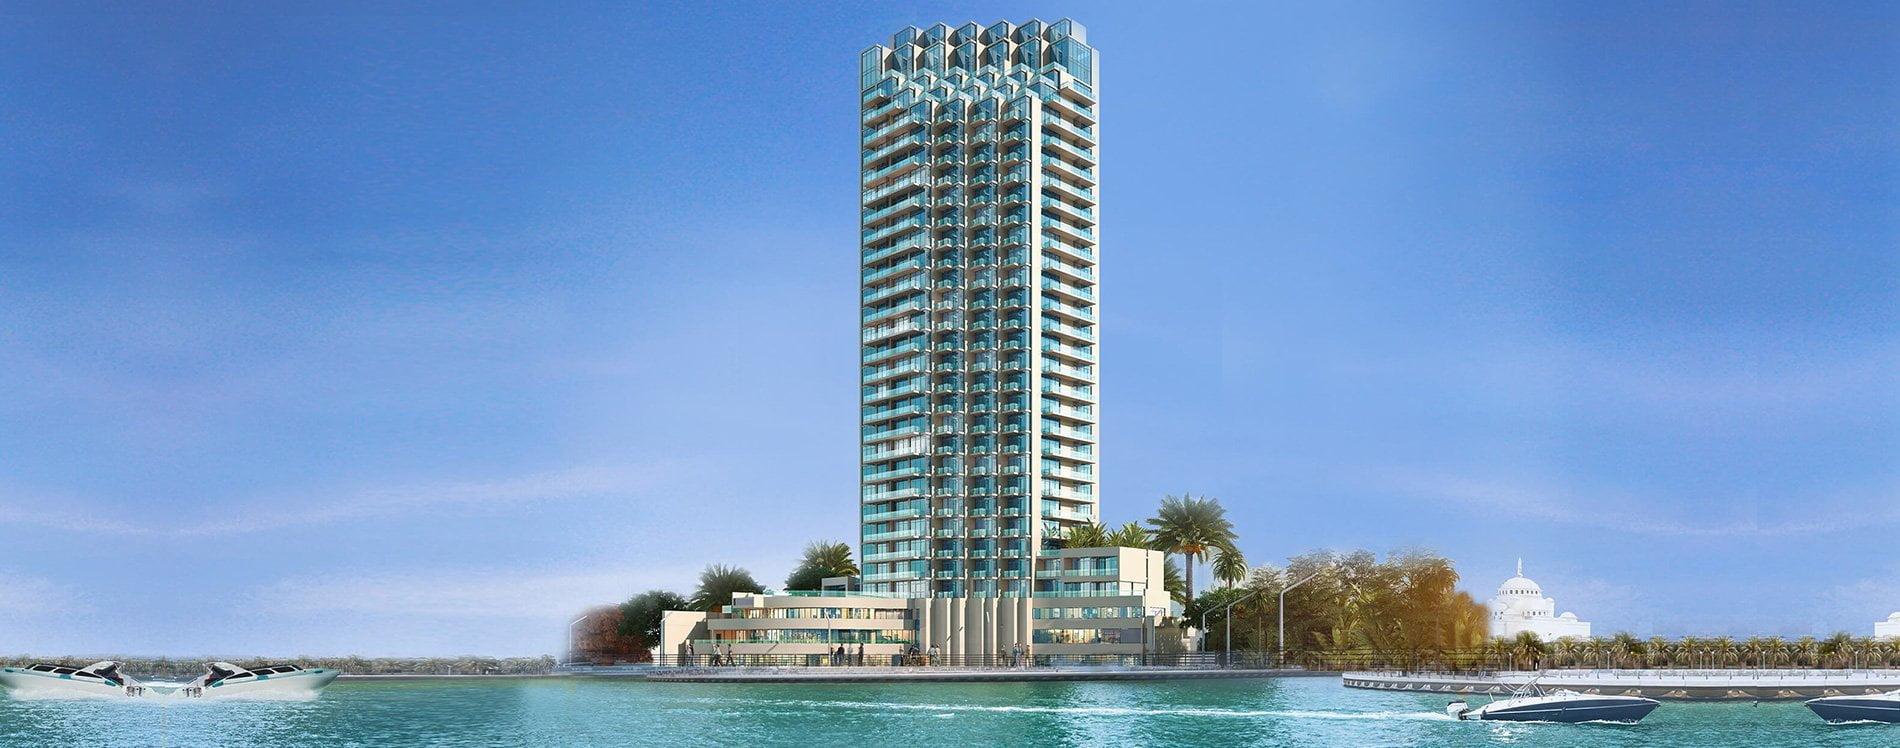 LIV Residence Apartments - Dubai Marina